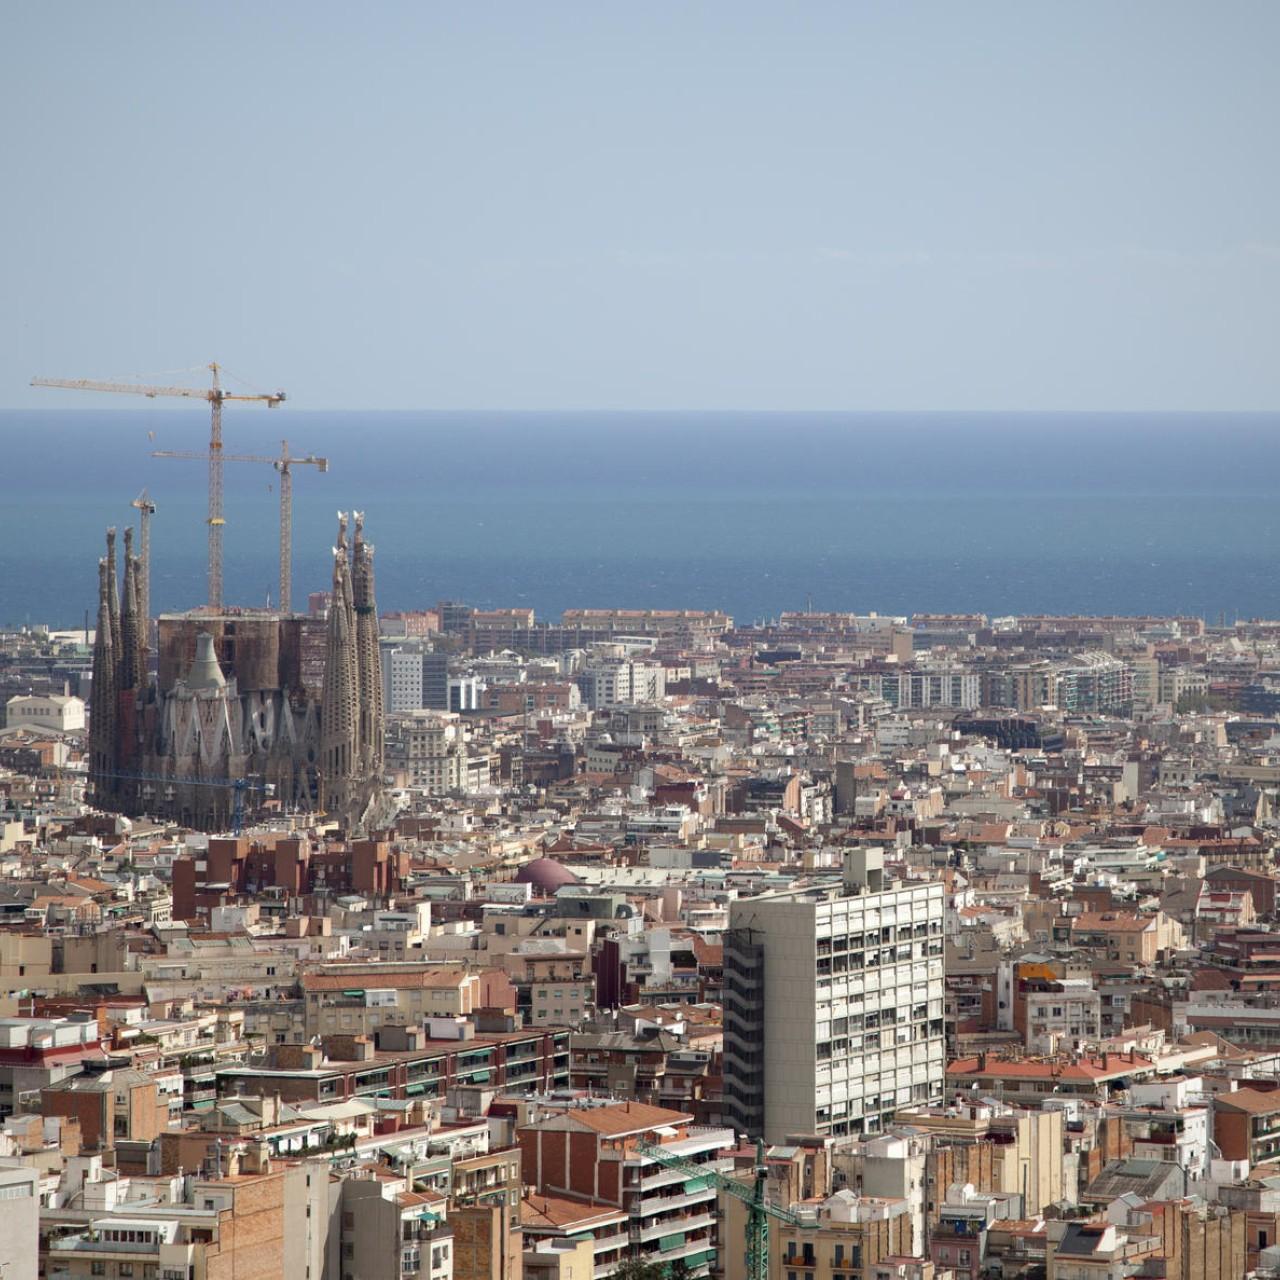 How Gaudi's eccentric Barcelona architecture has shaped